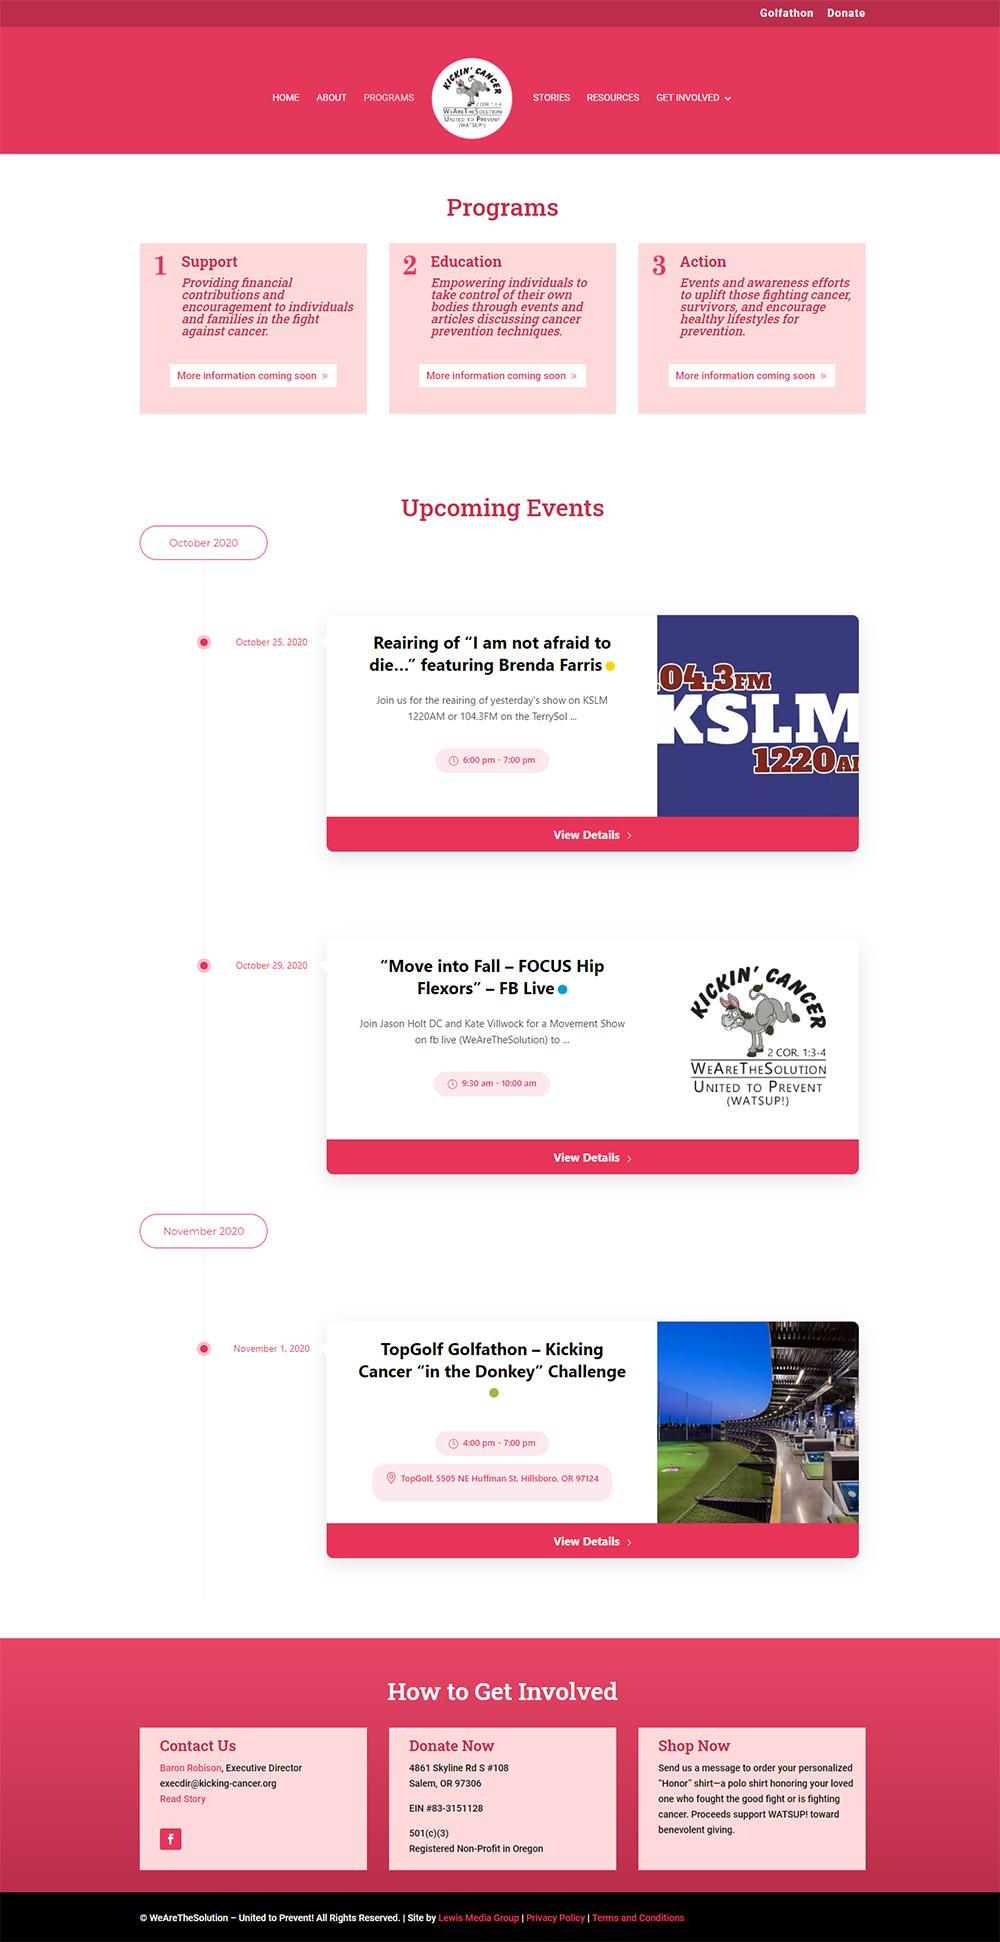 Kickin Cancer Events pg after Redesign